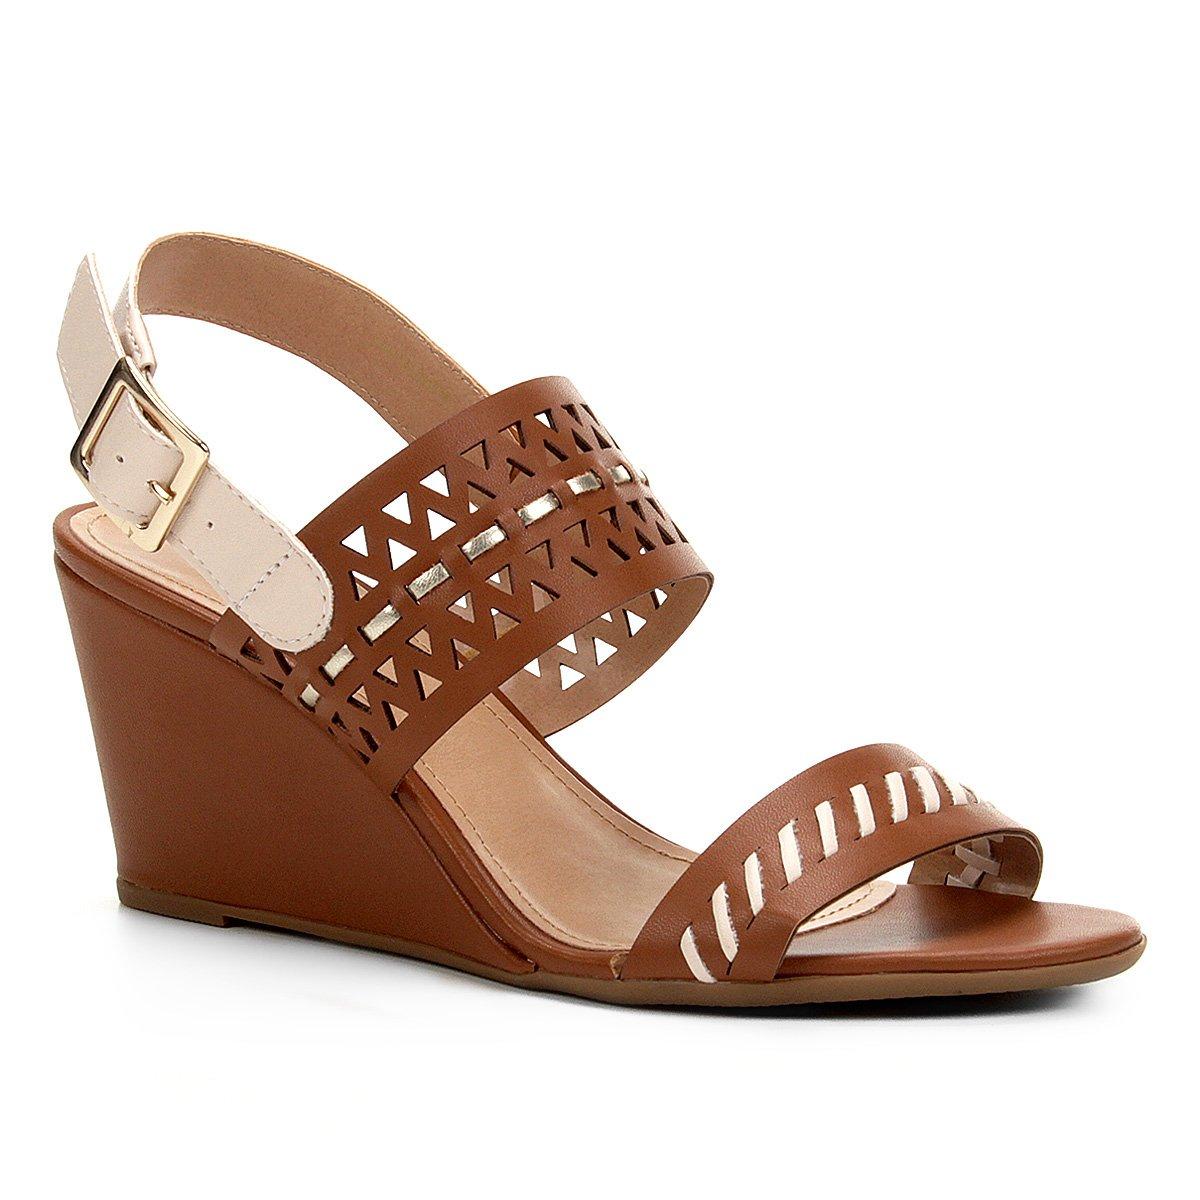 b3b30fbe6 Sandália Anabela Shoestock Laser Feminina - Compre Agora